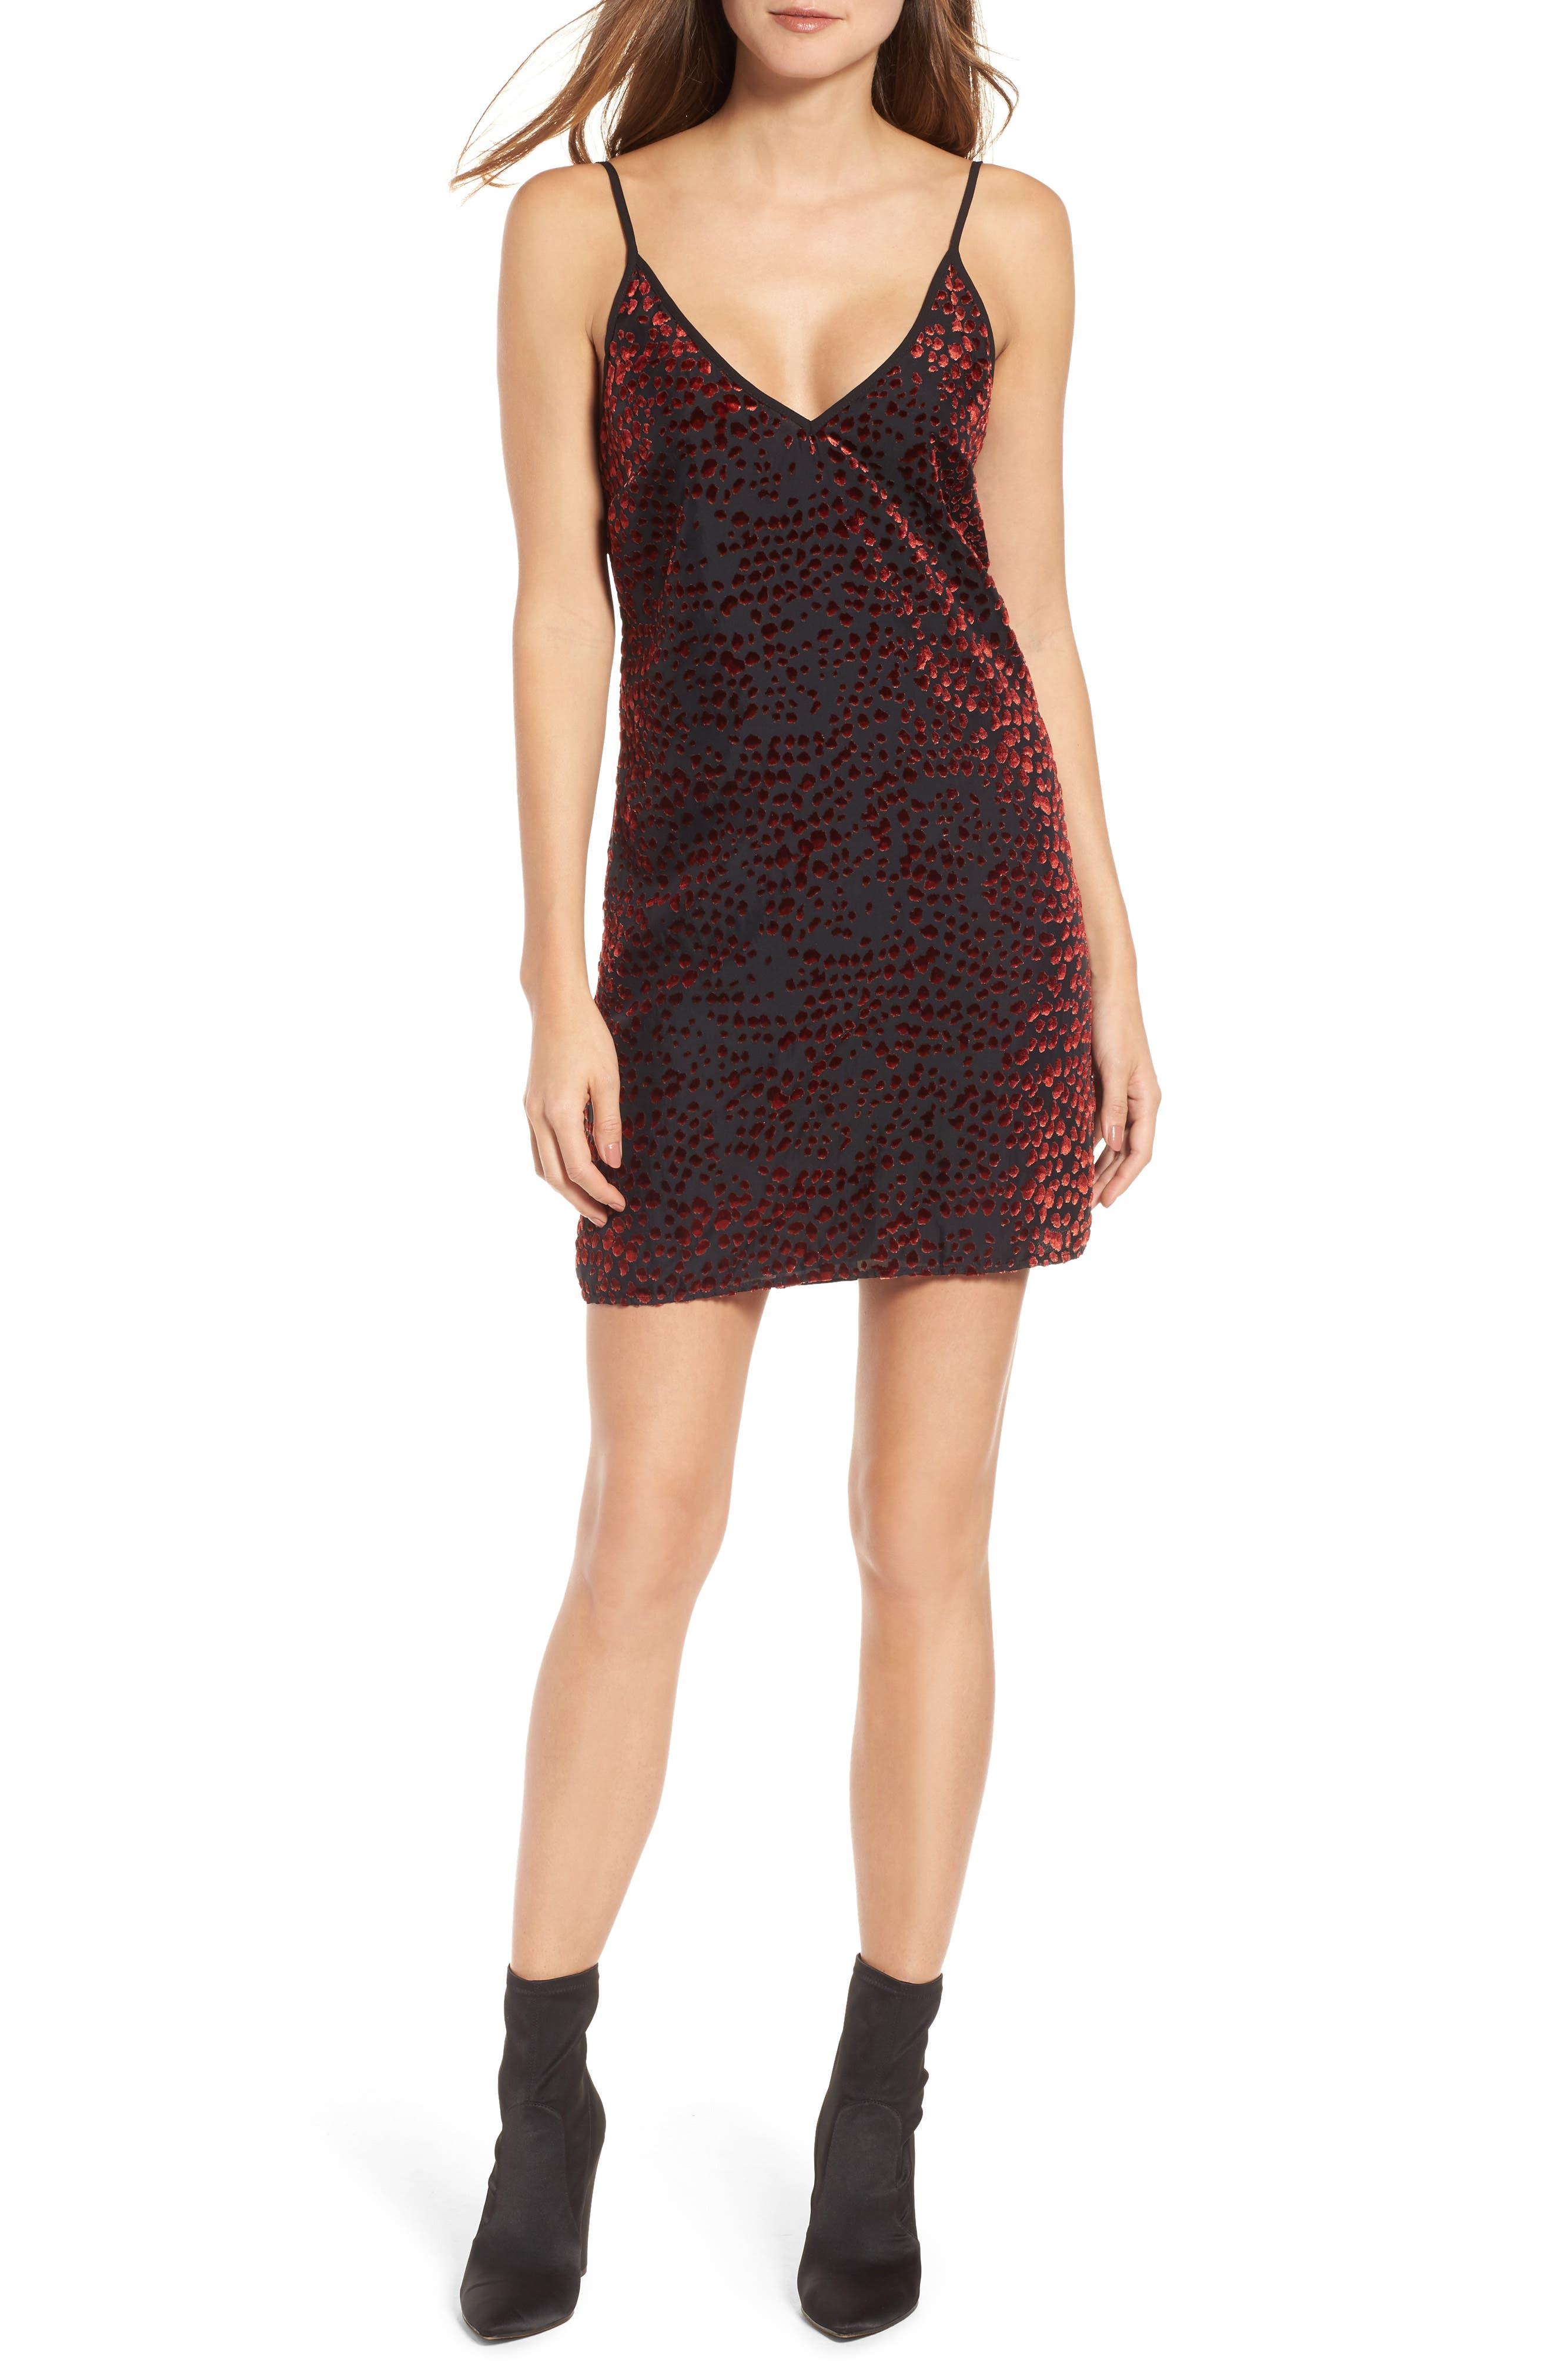 Lamont Cowl Back Minidress,                         Main,                         color, Red Leopard